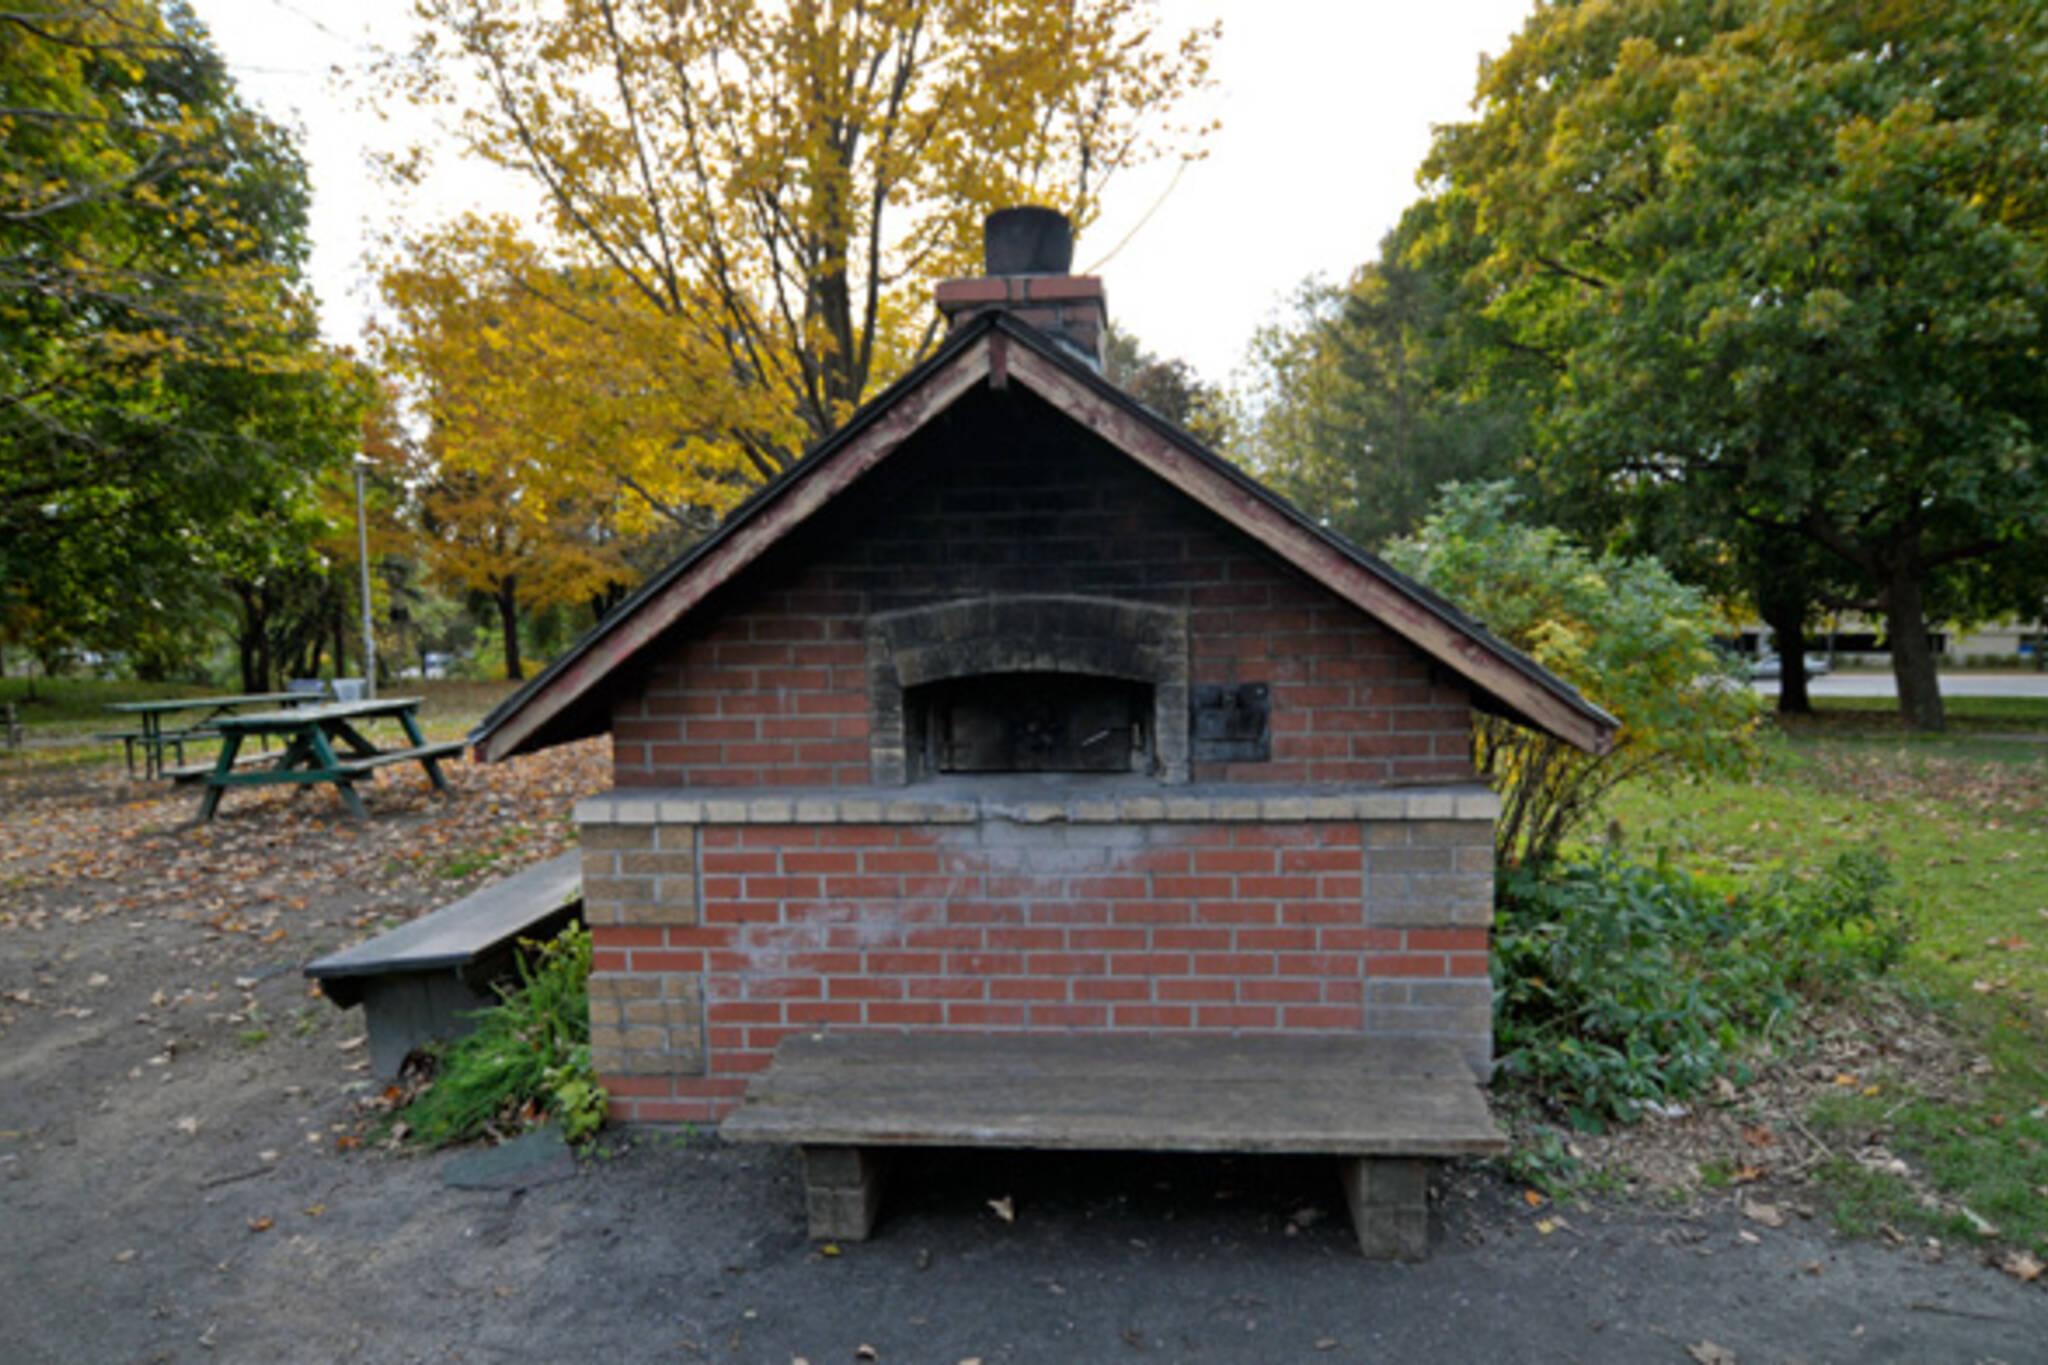 Dufferin Grove Bake Oven